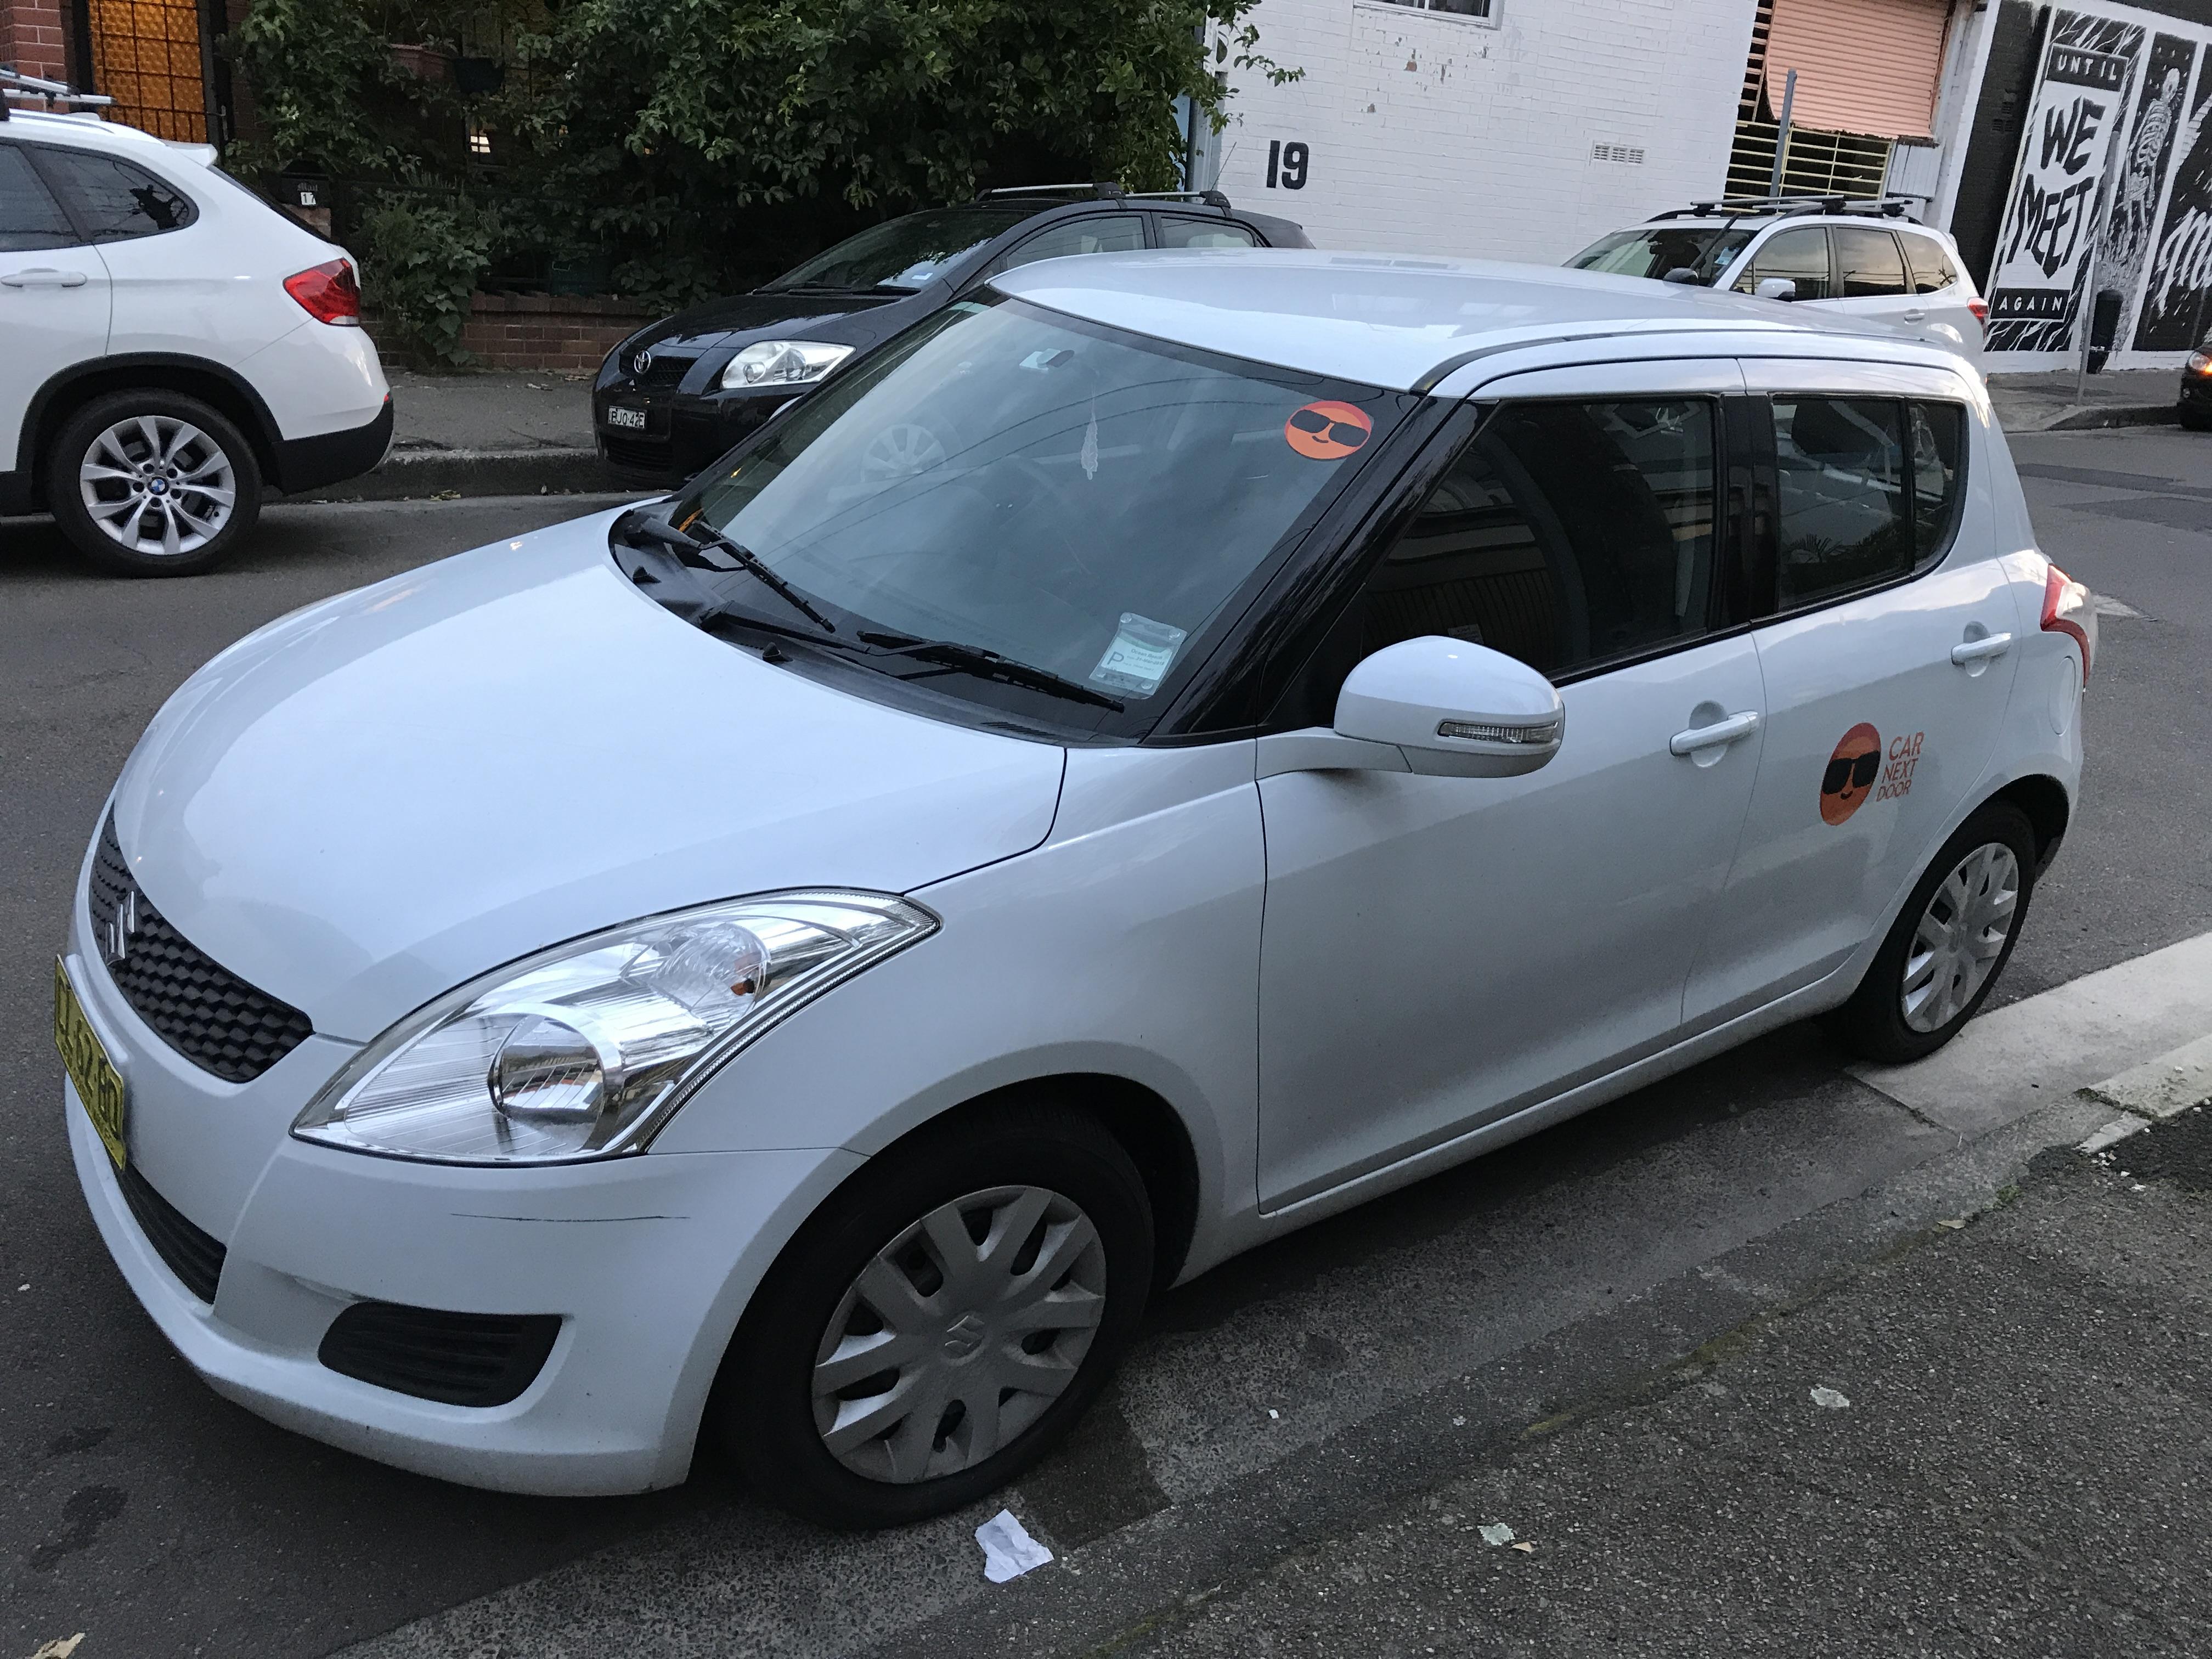 Picture of Hannah's 2011 Suzuki Swift